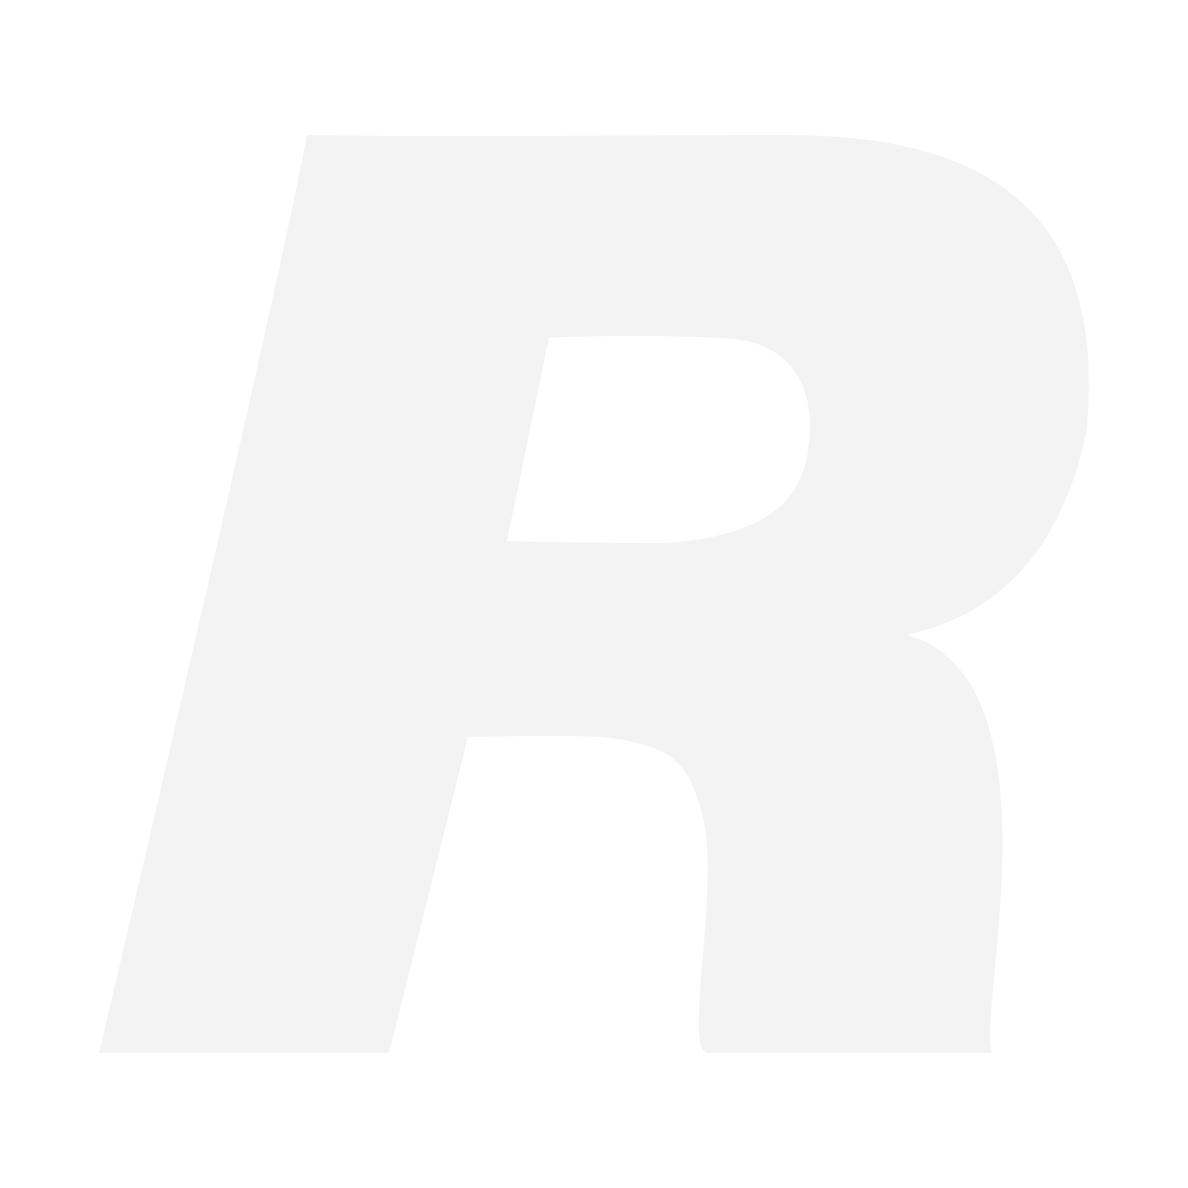 Sony LCS-RXG